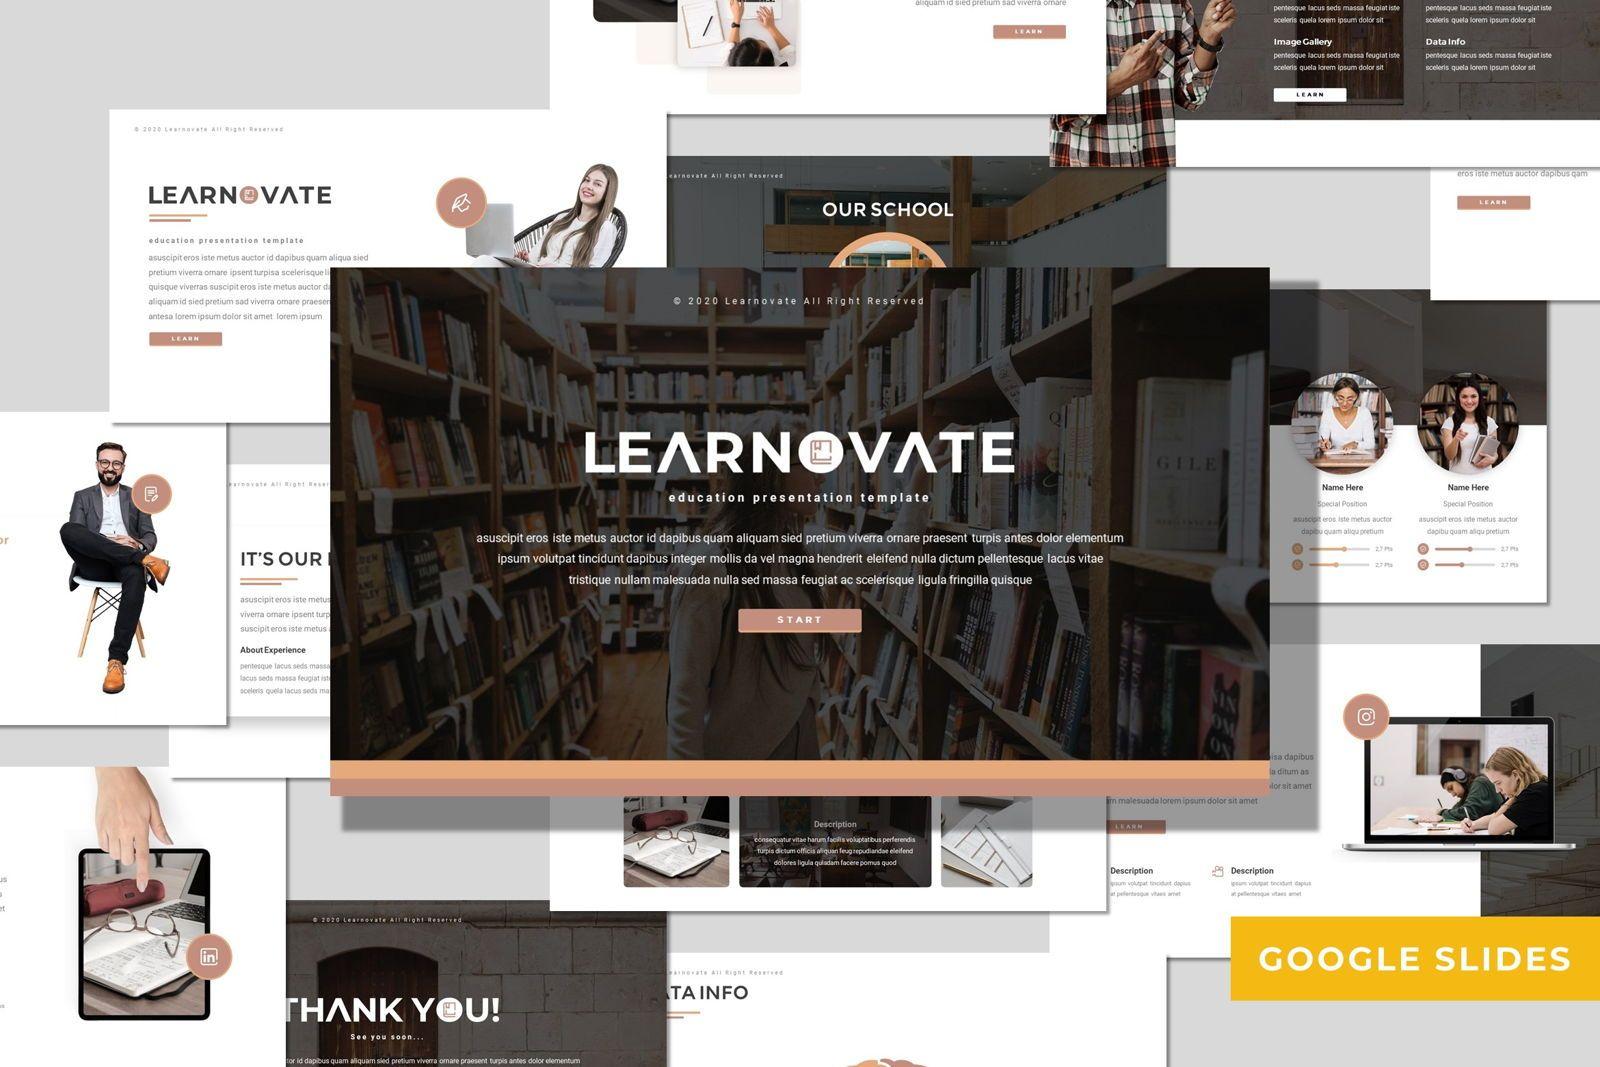 Learnovate - Google Slides Template, 08056, Presentation Templates — PoweredTemplate.com